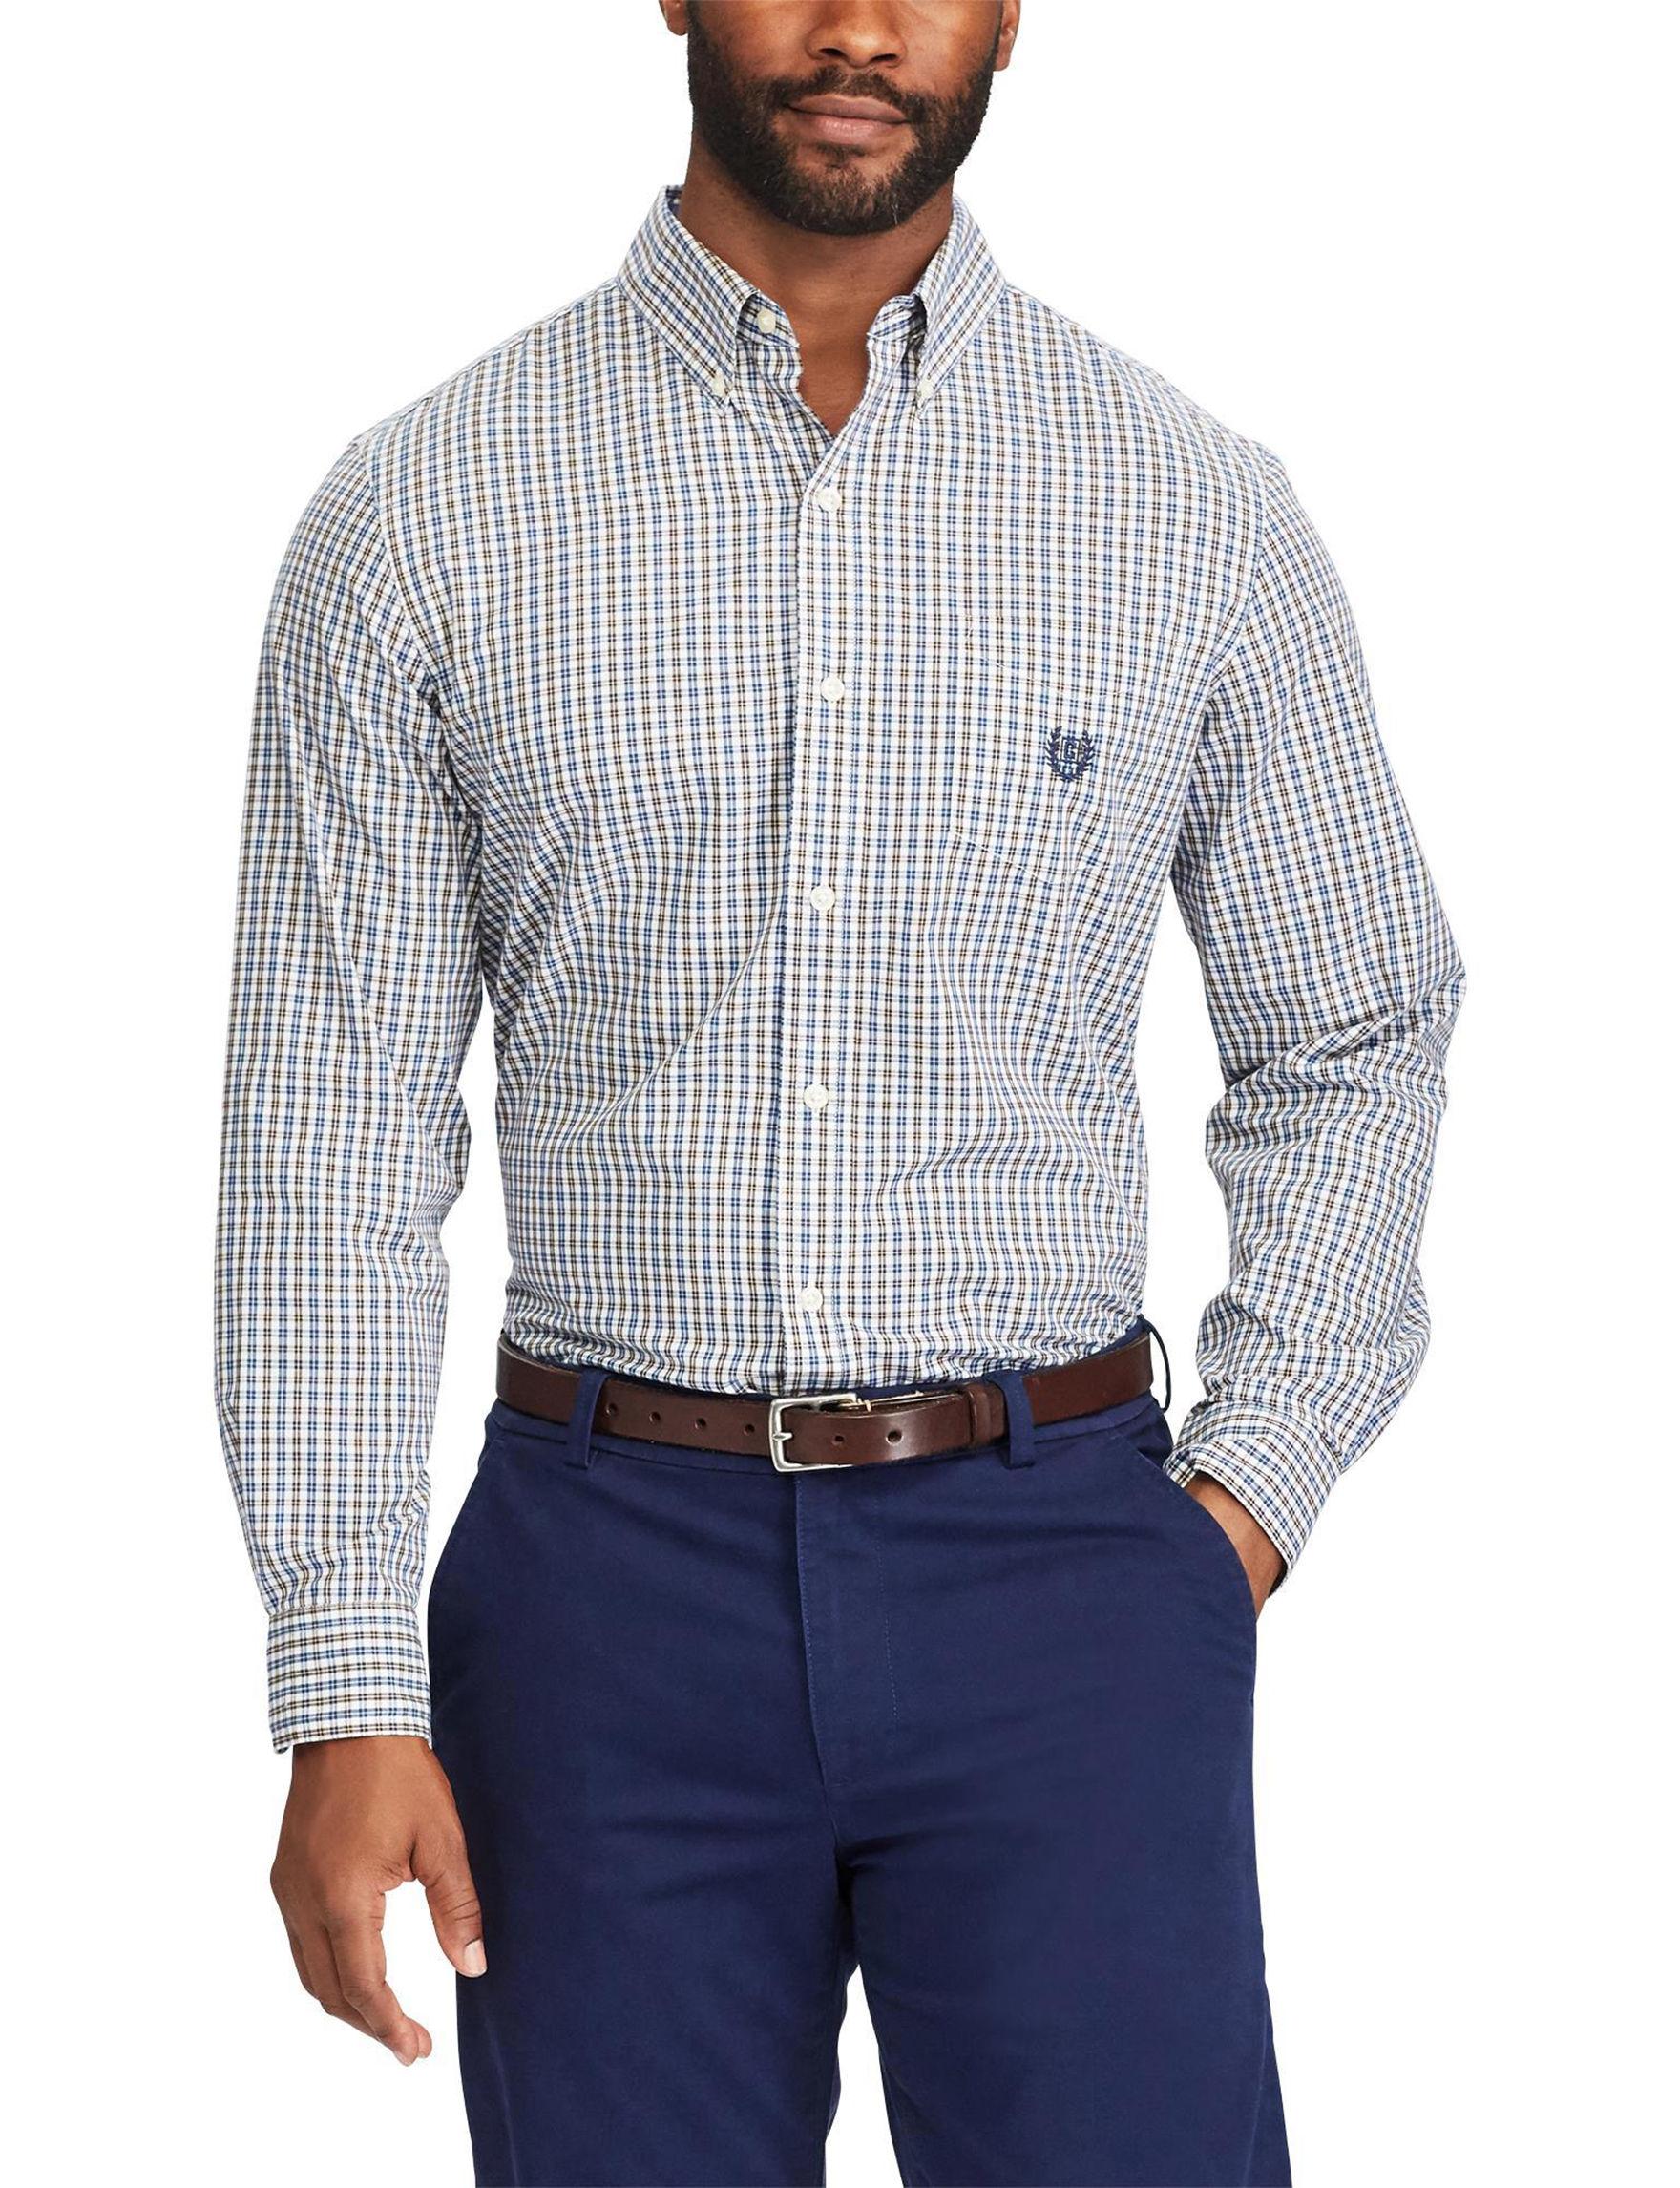 Chaps Brown Casual Button Down Shirts